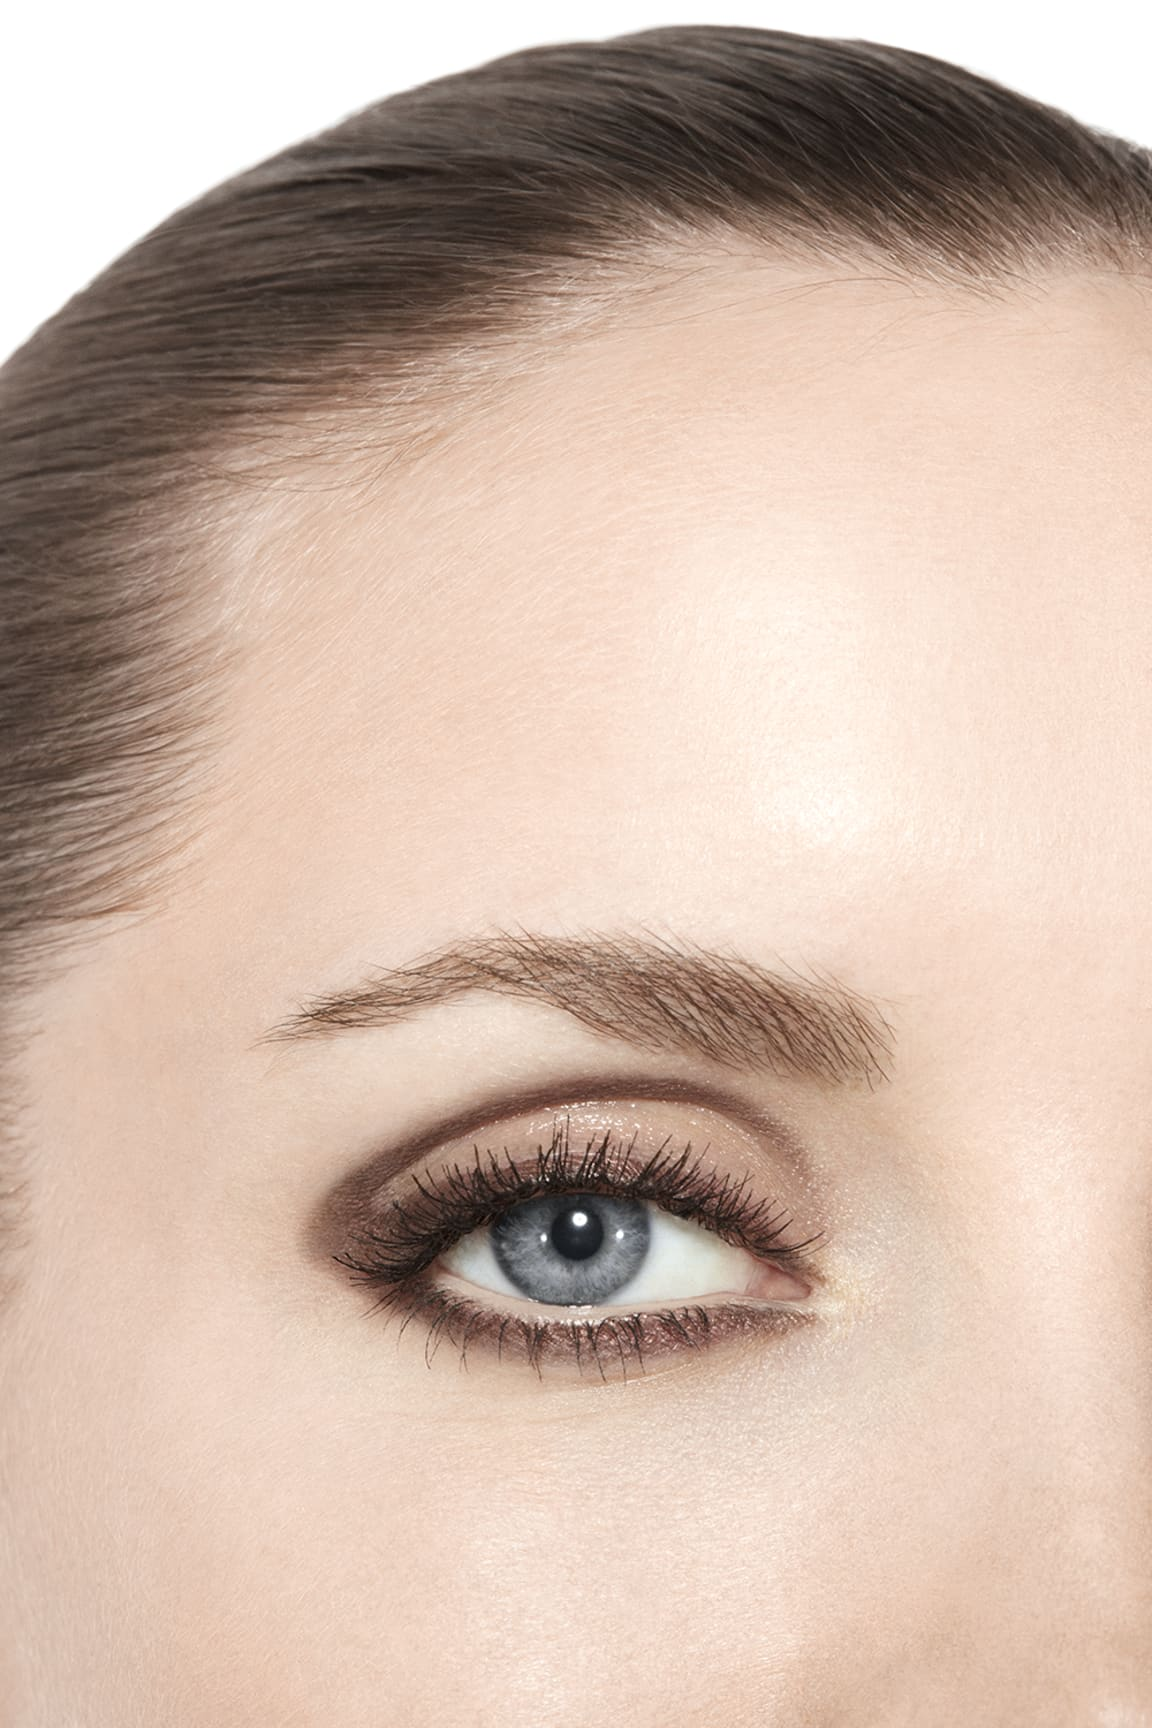 Application makeup visual 3 - STYLO OMBRE ET CONTOUR 04 - ELECTRIC BROWN